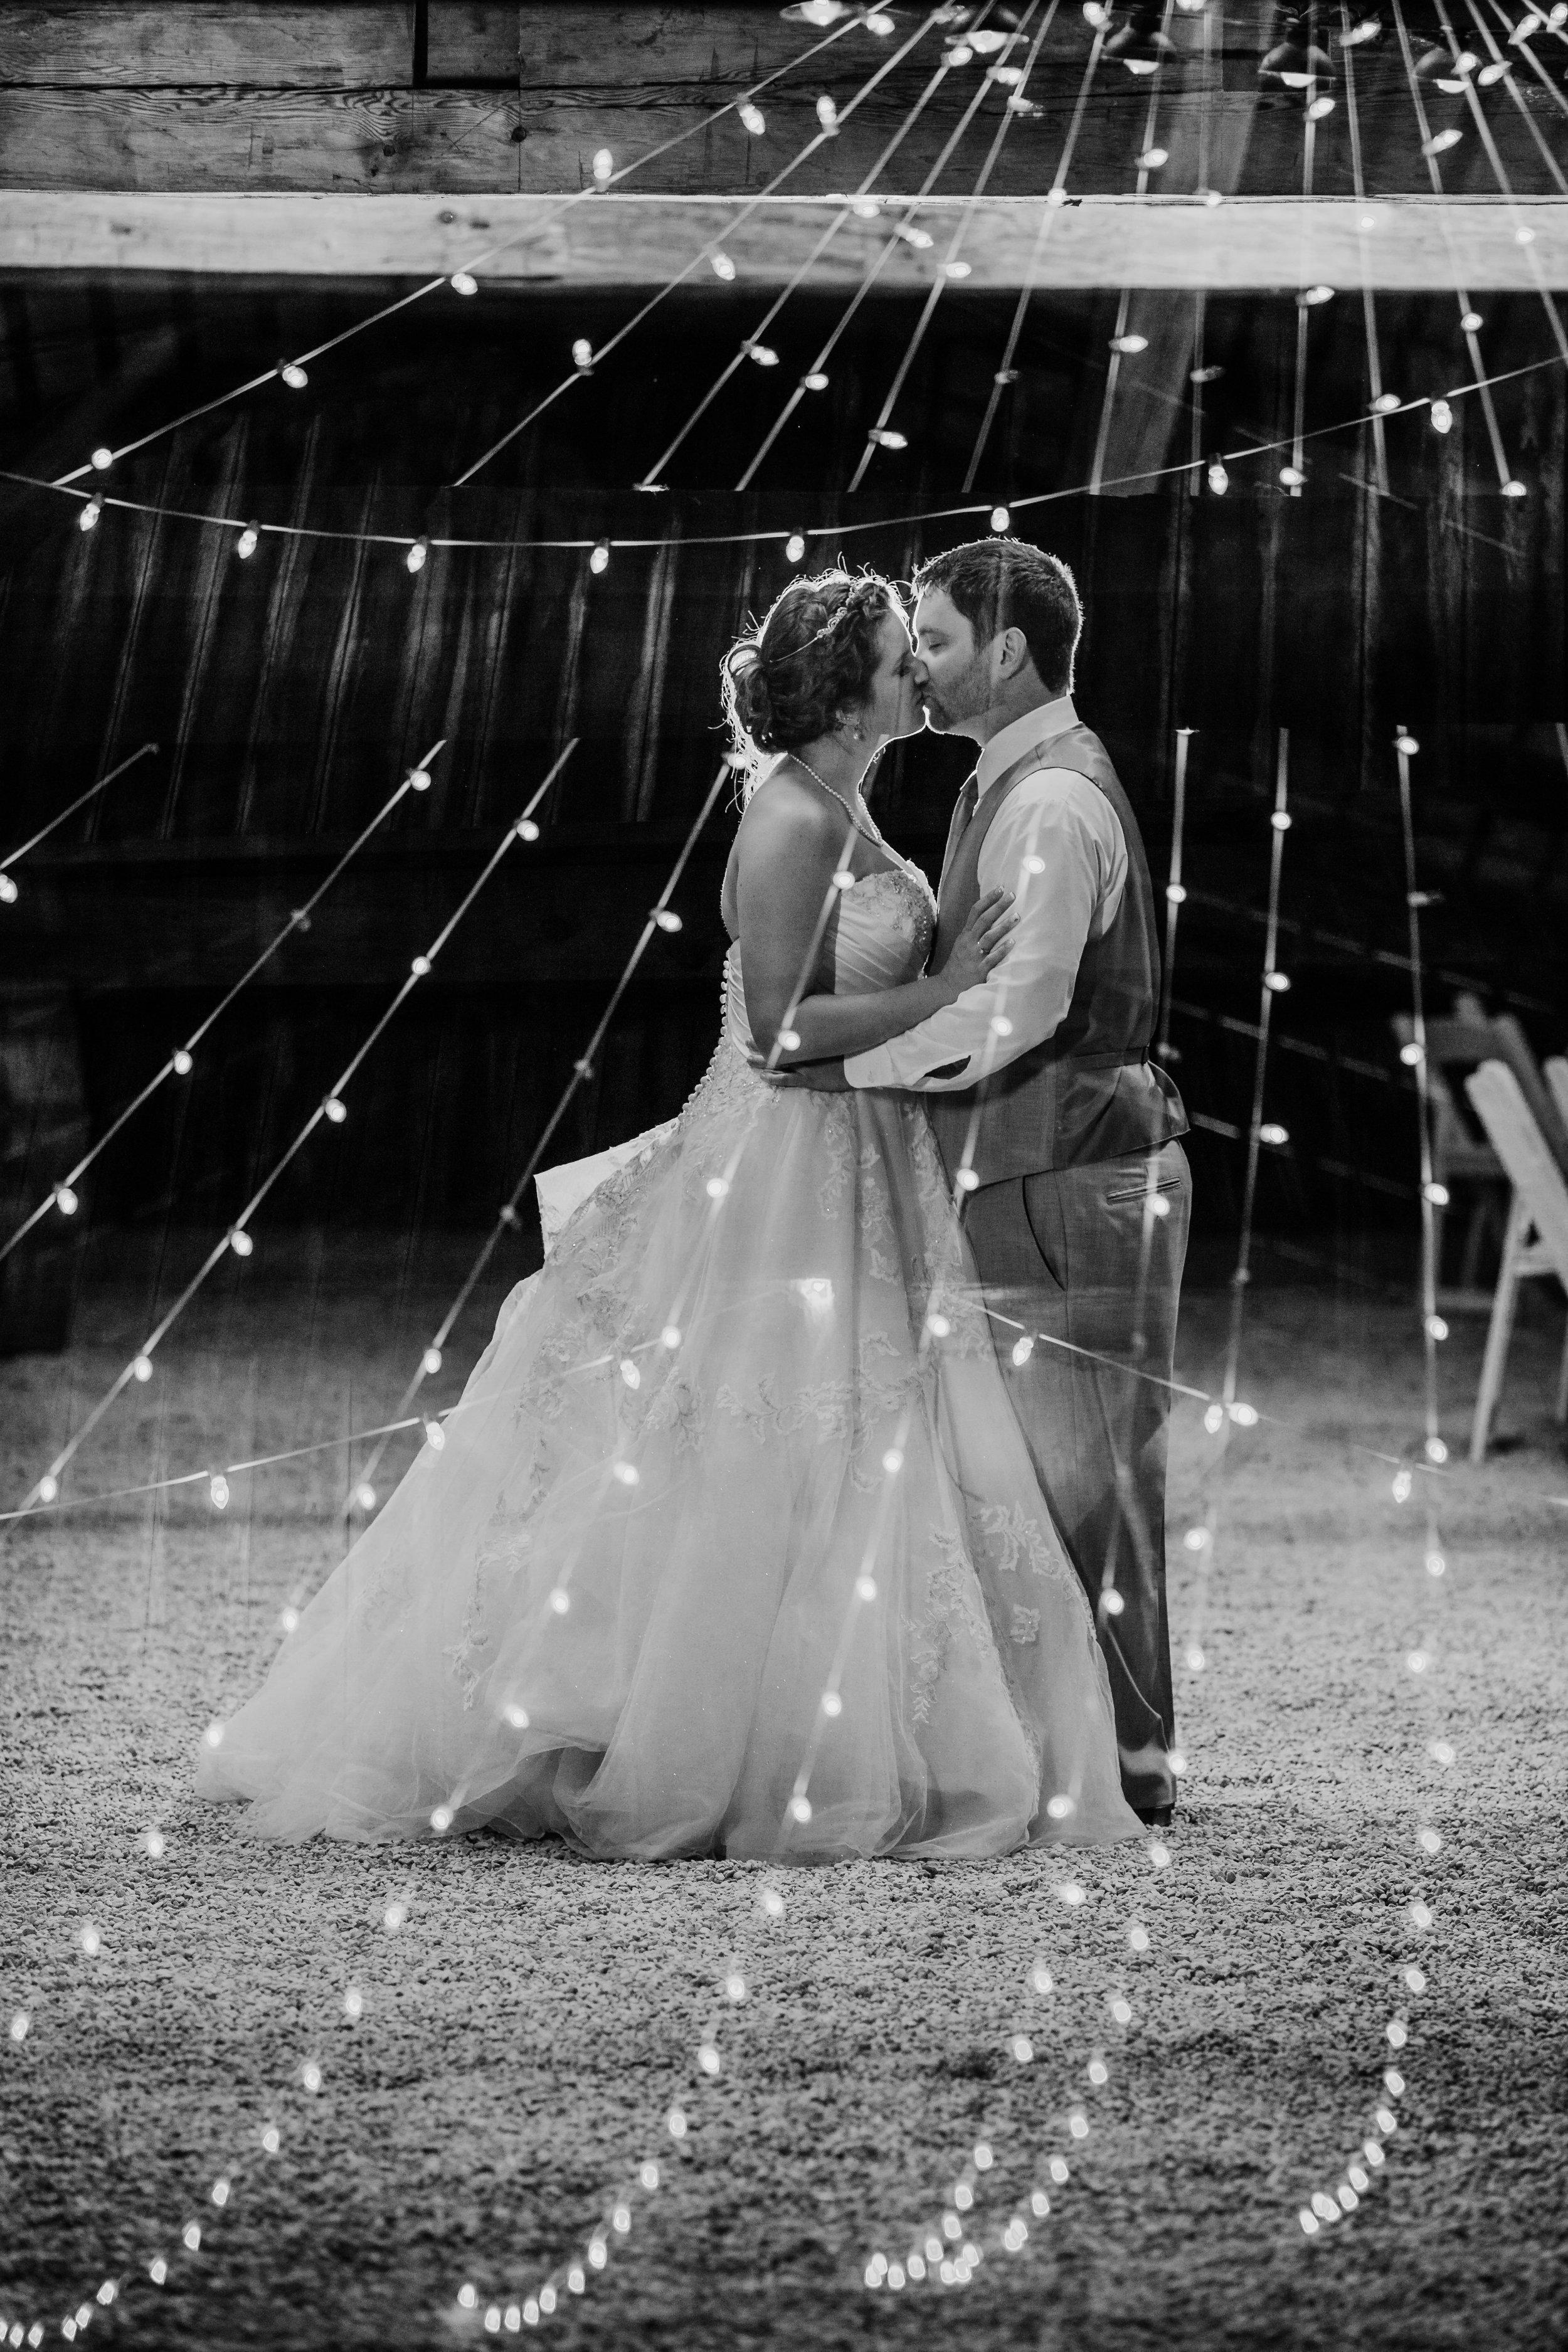 Gorgeous Barn Wedding Photos - A Pennsylvania Barn Swallow Farm Wedding